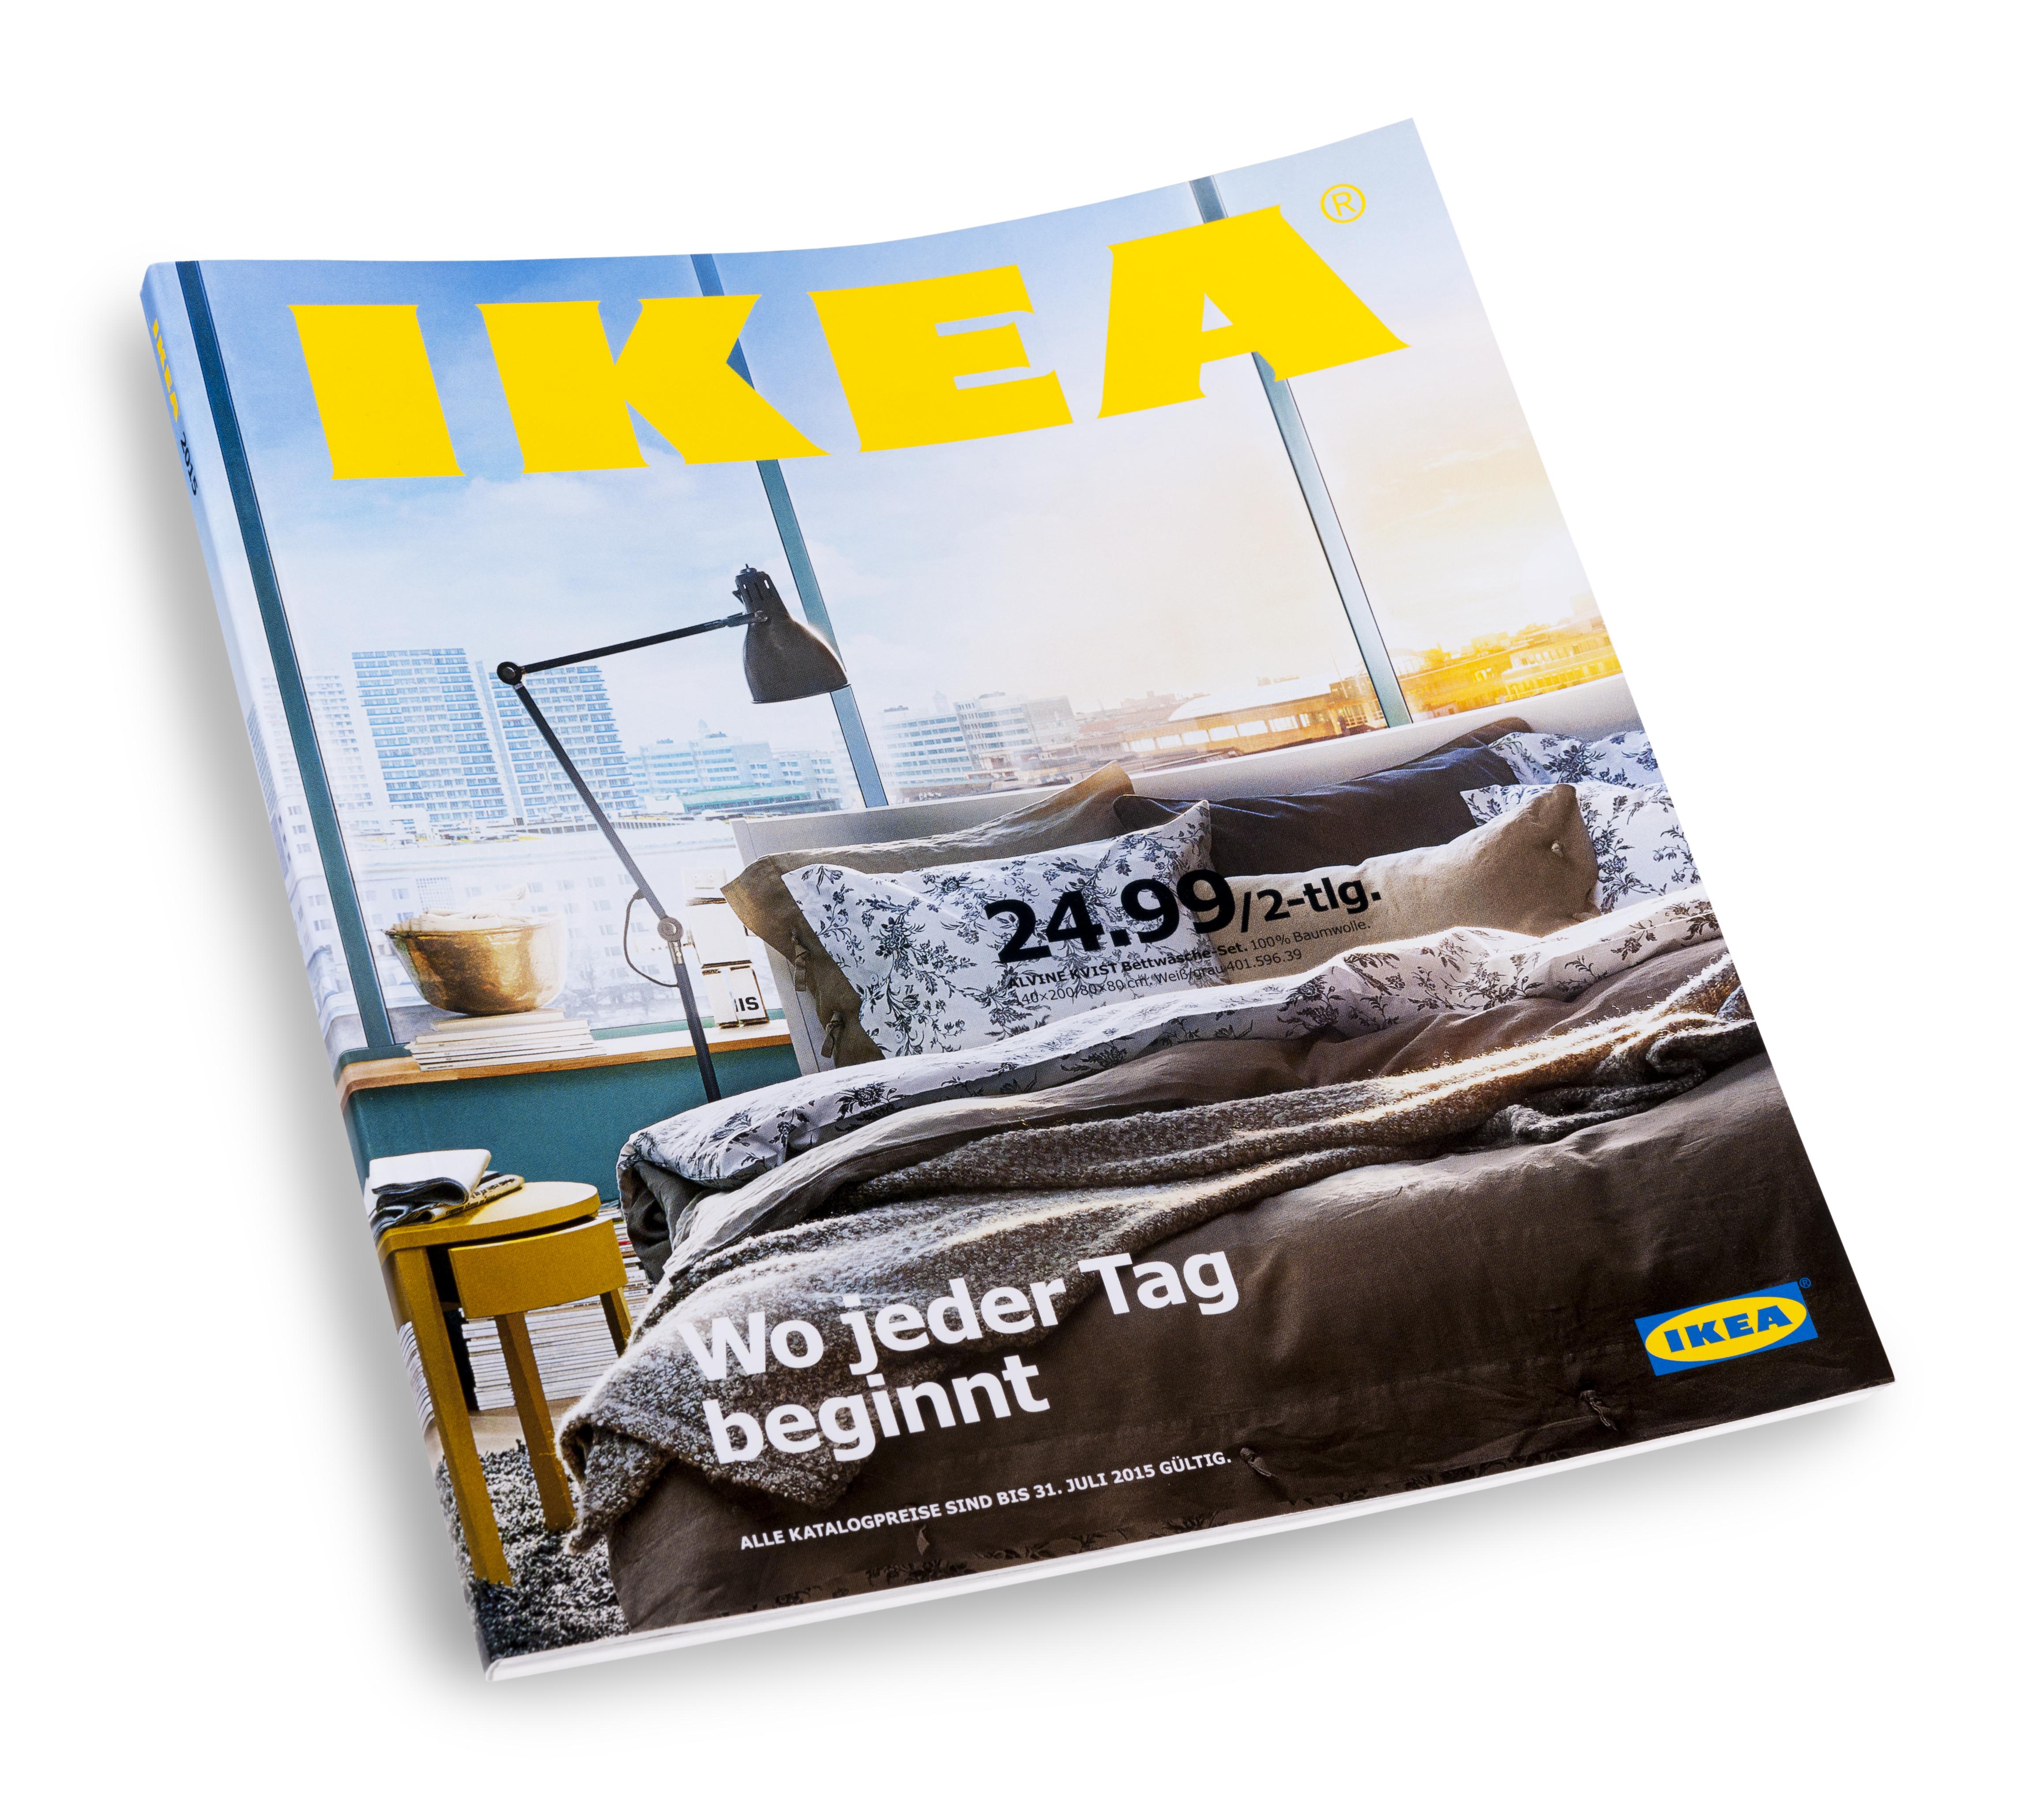 f r einen guten start in den tag ikea katalog 2015 r ckt. Black Bedroom Furniture Sets. Home Design Ideas